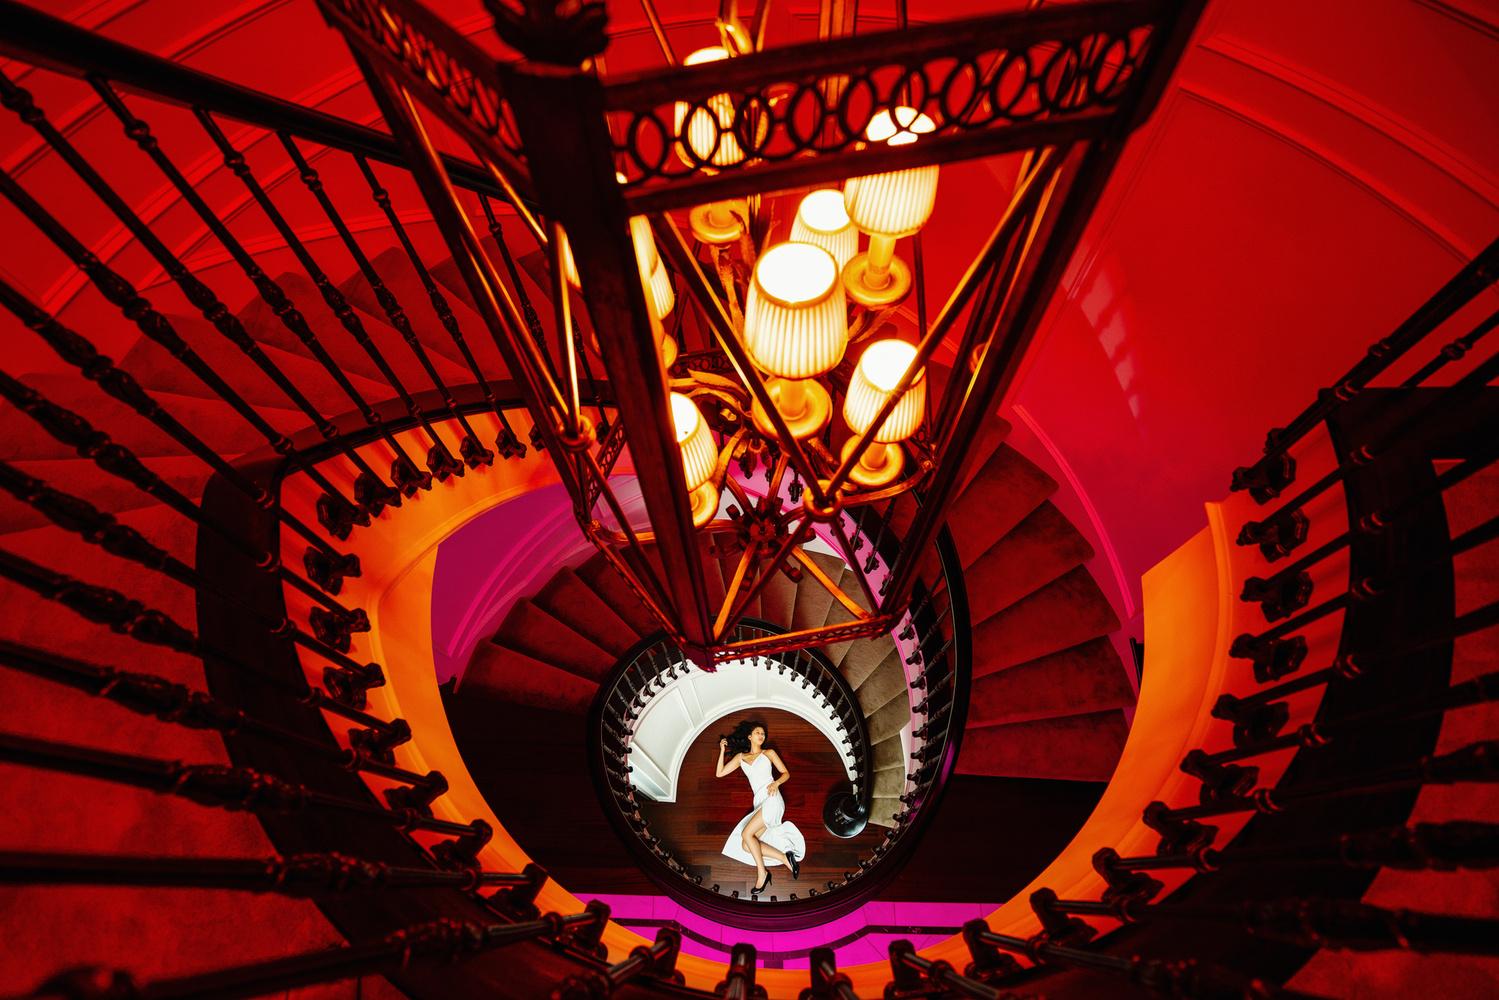 Colour Staircase #3 by Josh Stuart